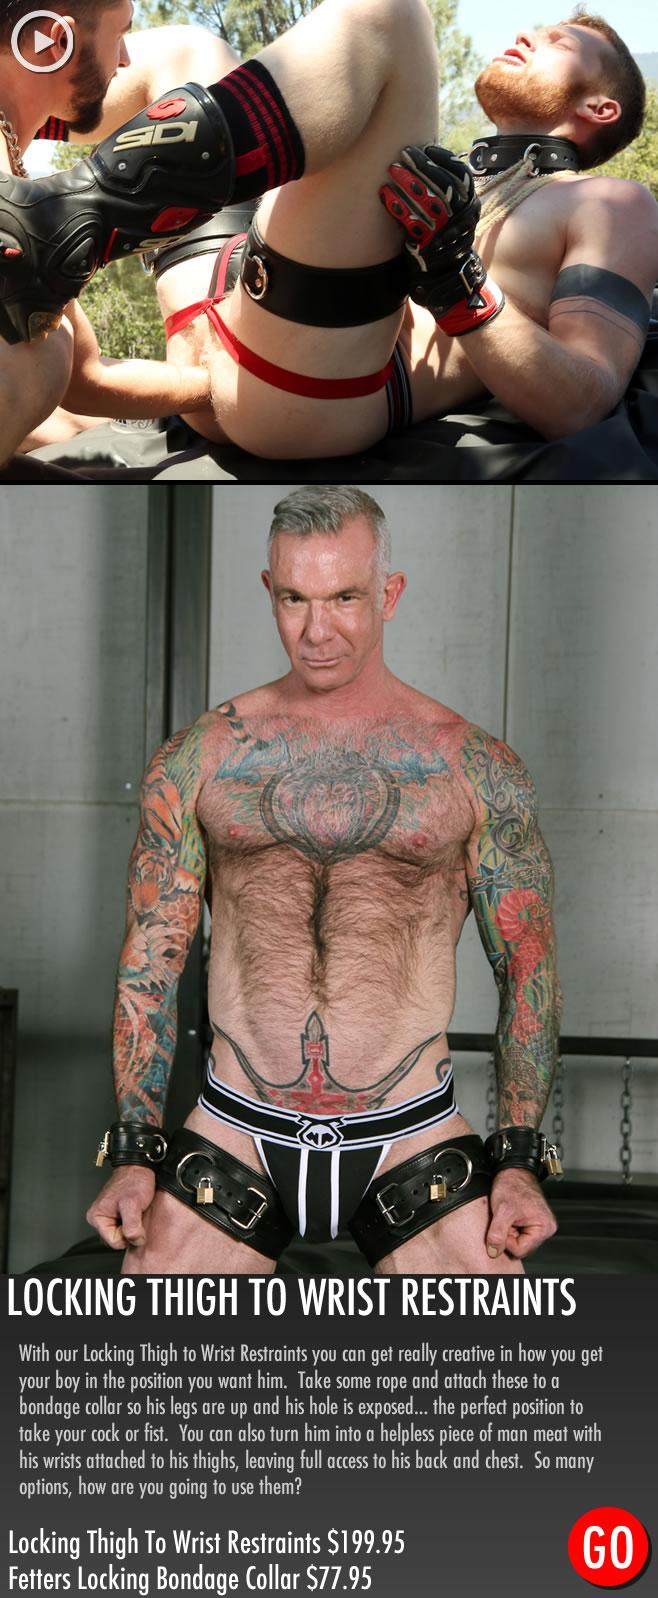 Gay_Bondage_Locking_Thigh_to_Wrist_Restraints